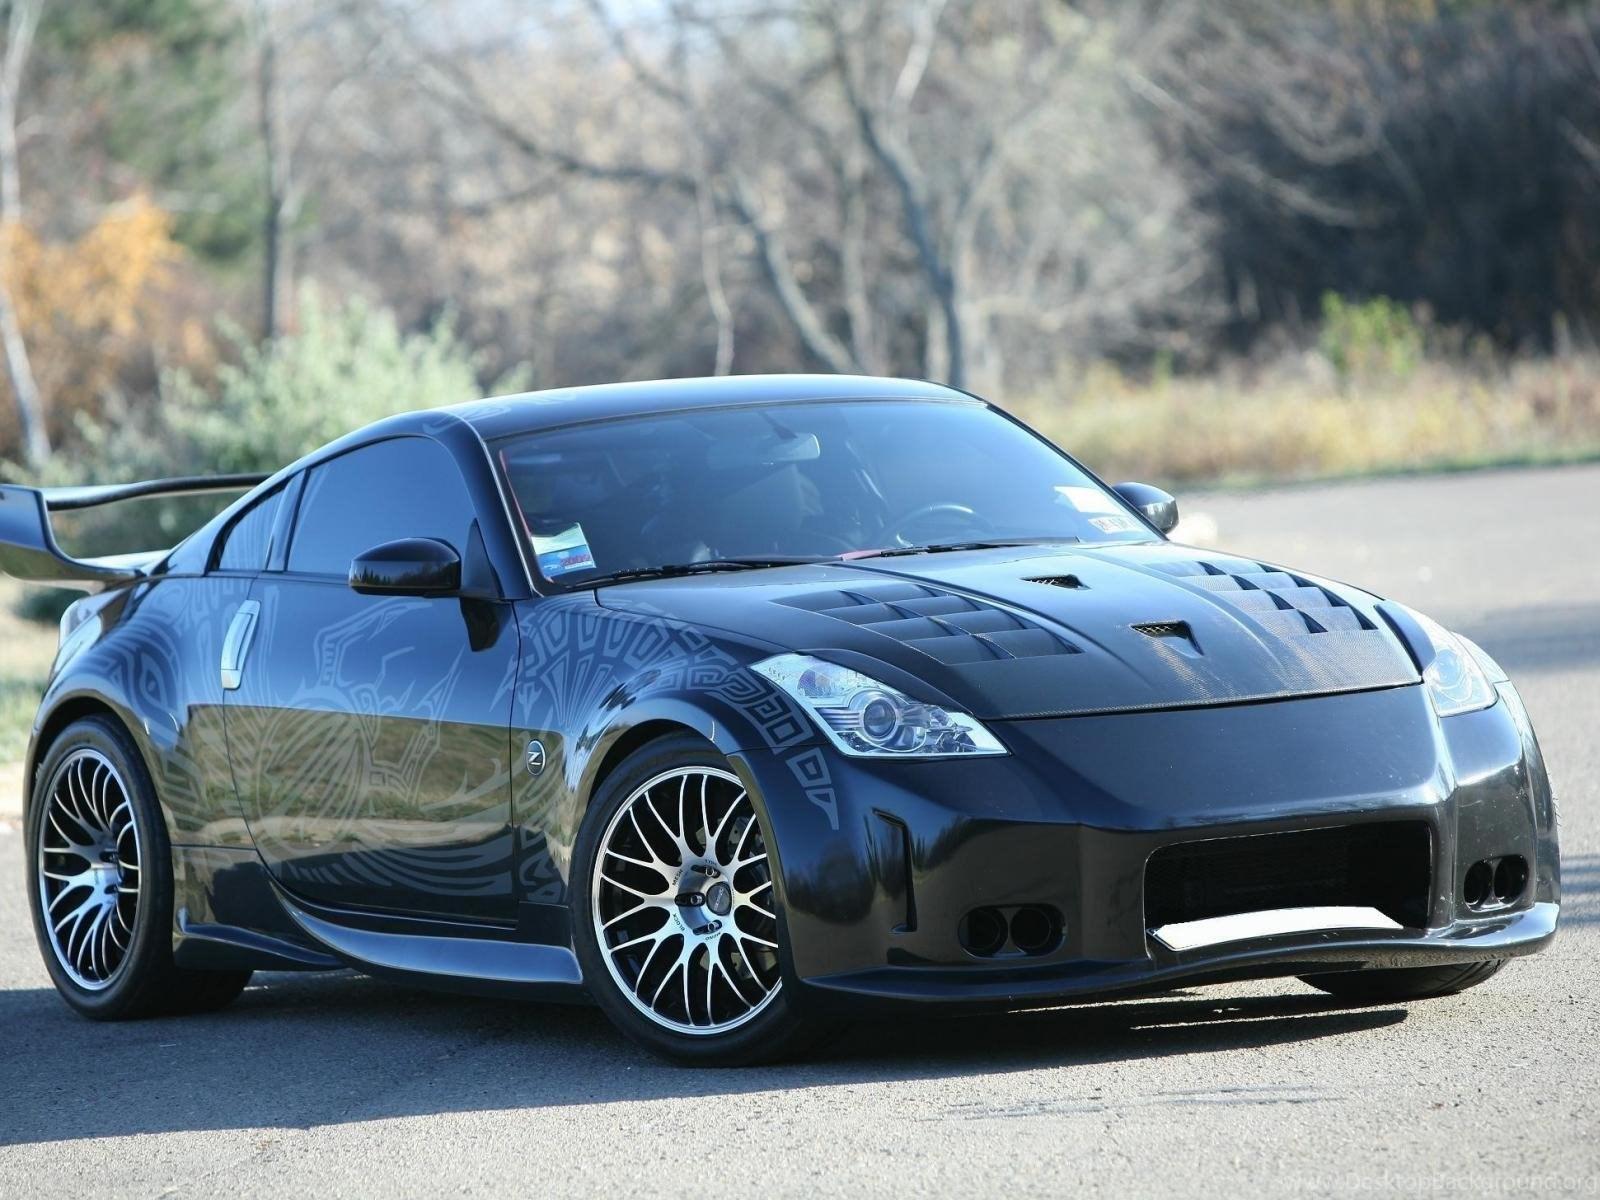 Fast And Furious Nissan 350z Tokyo Drift Cars Wallpapers Desktop Background